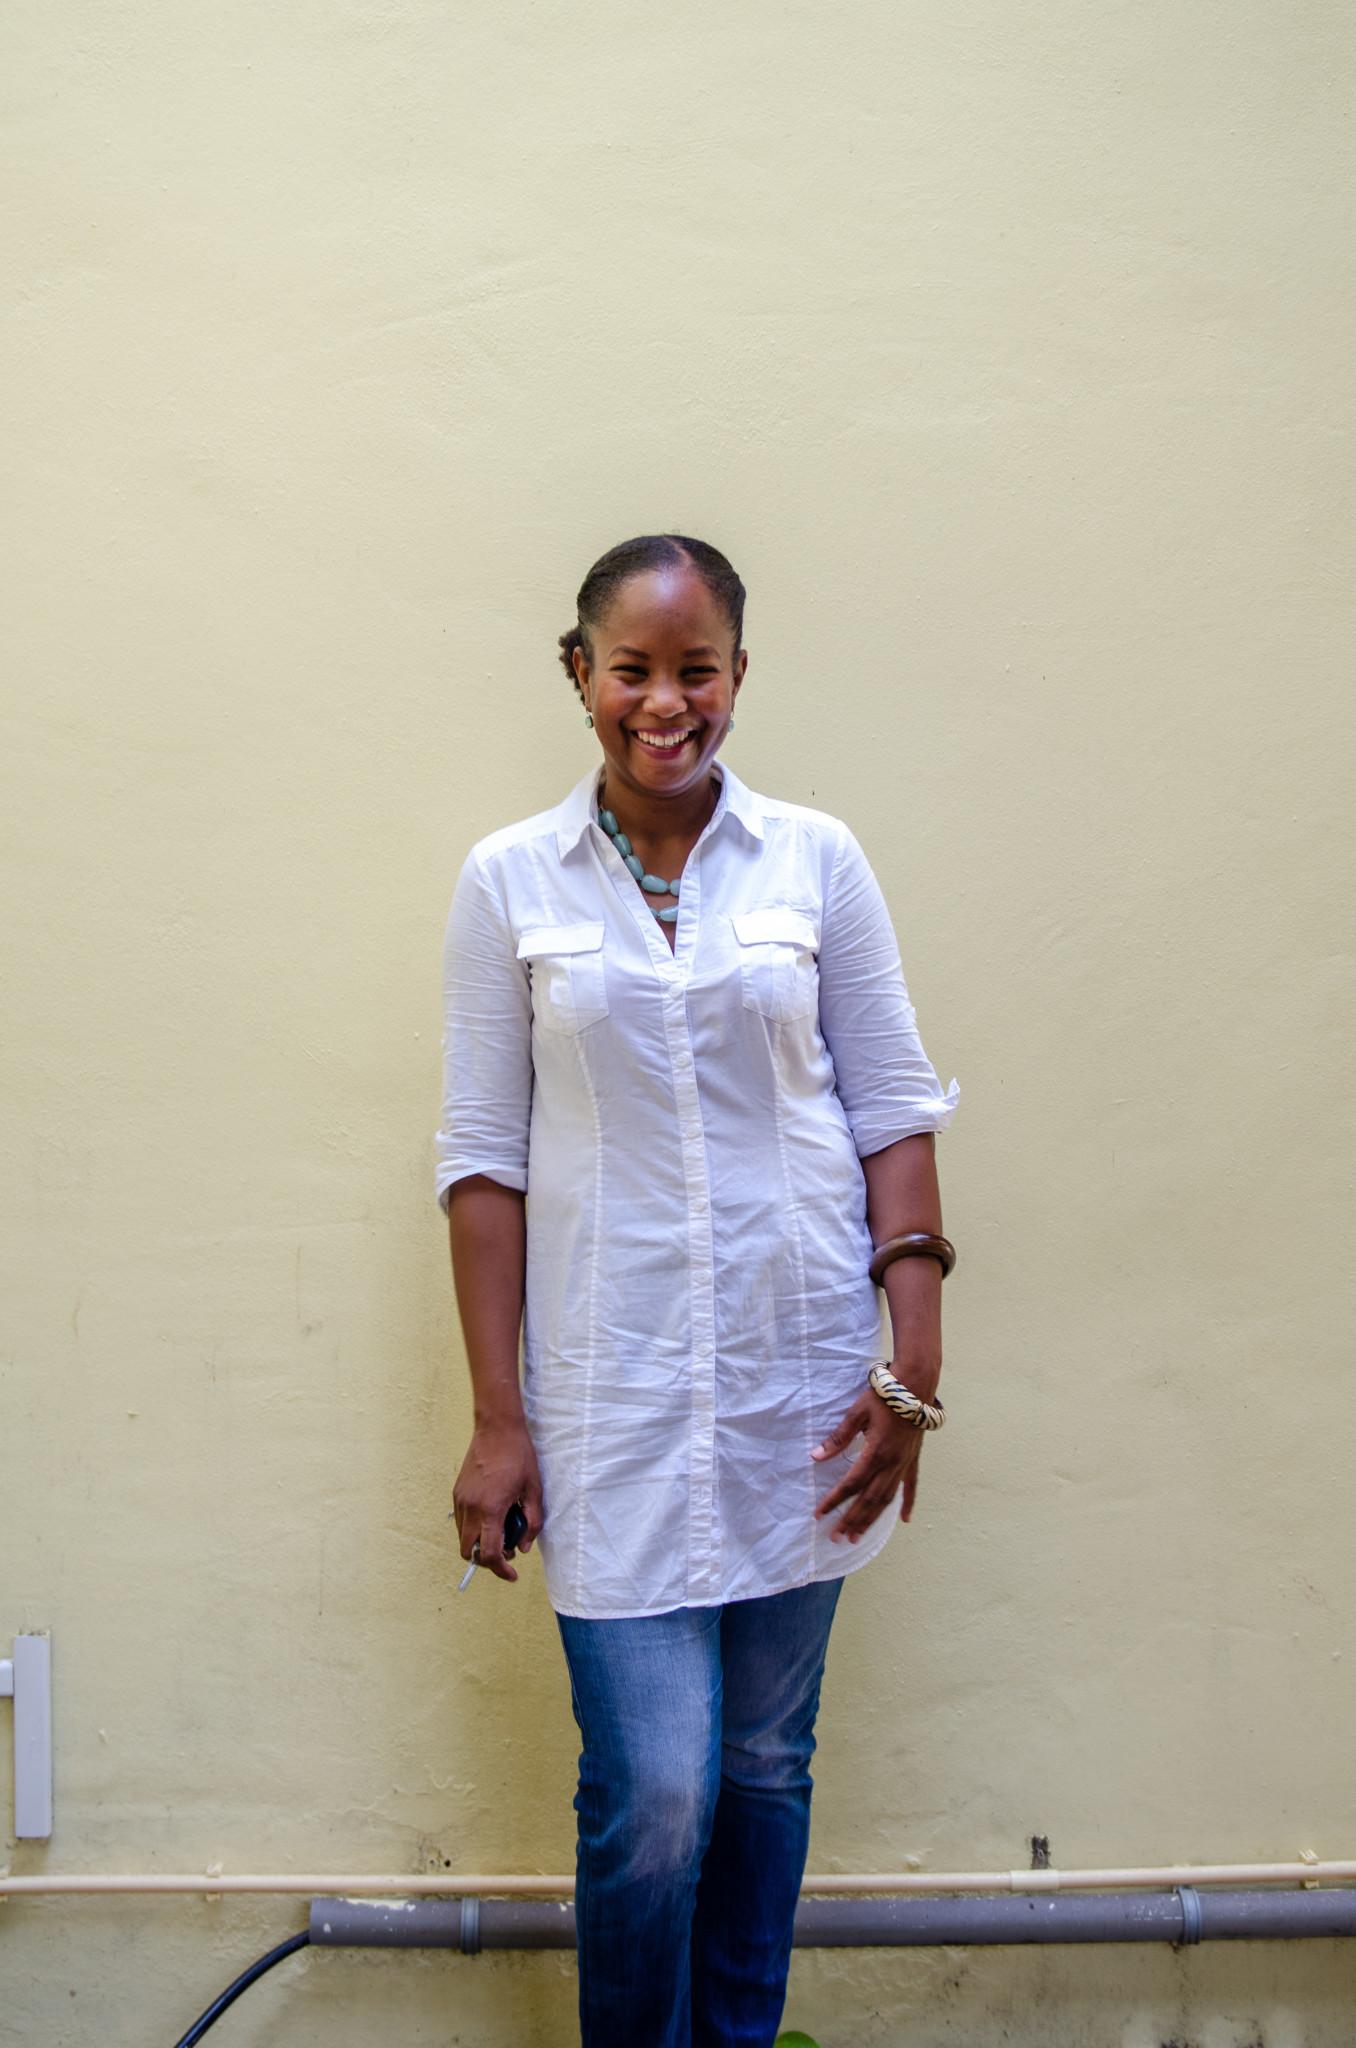 Swetlana bietet hausgemachtes Frühstück auf Curacao an